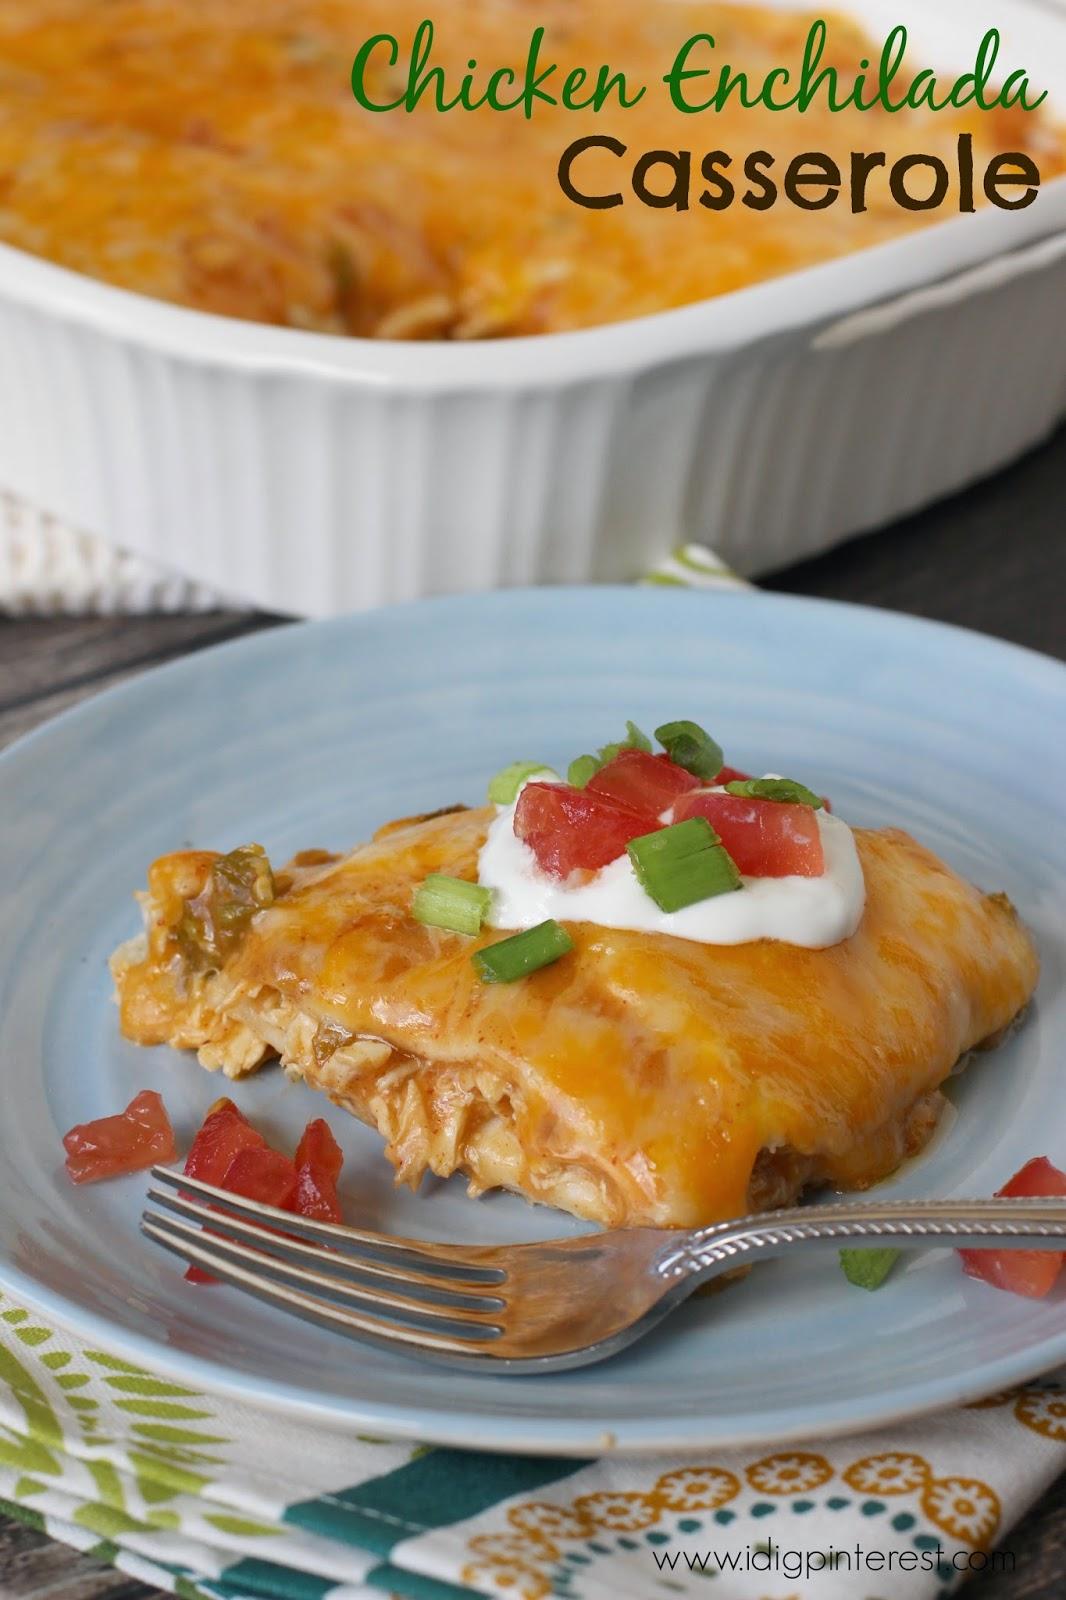 I Dig Pinterest: Easy Chicken Enchilada Casserole: Help a ...